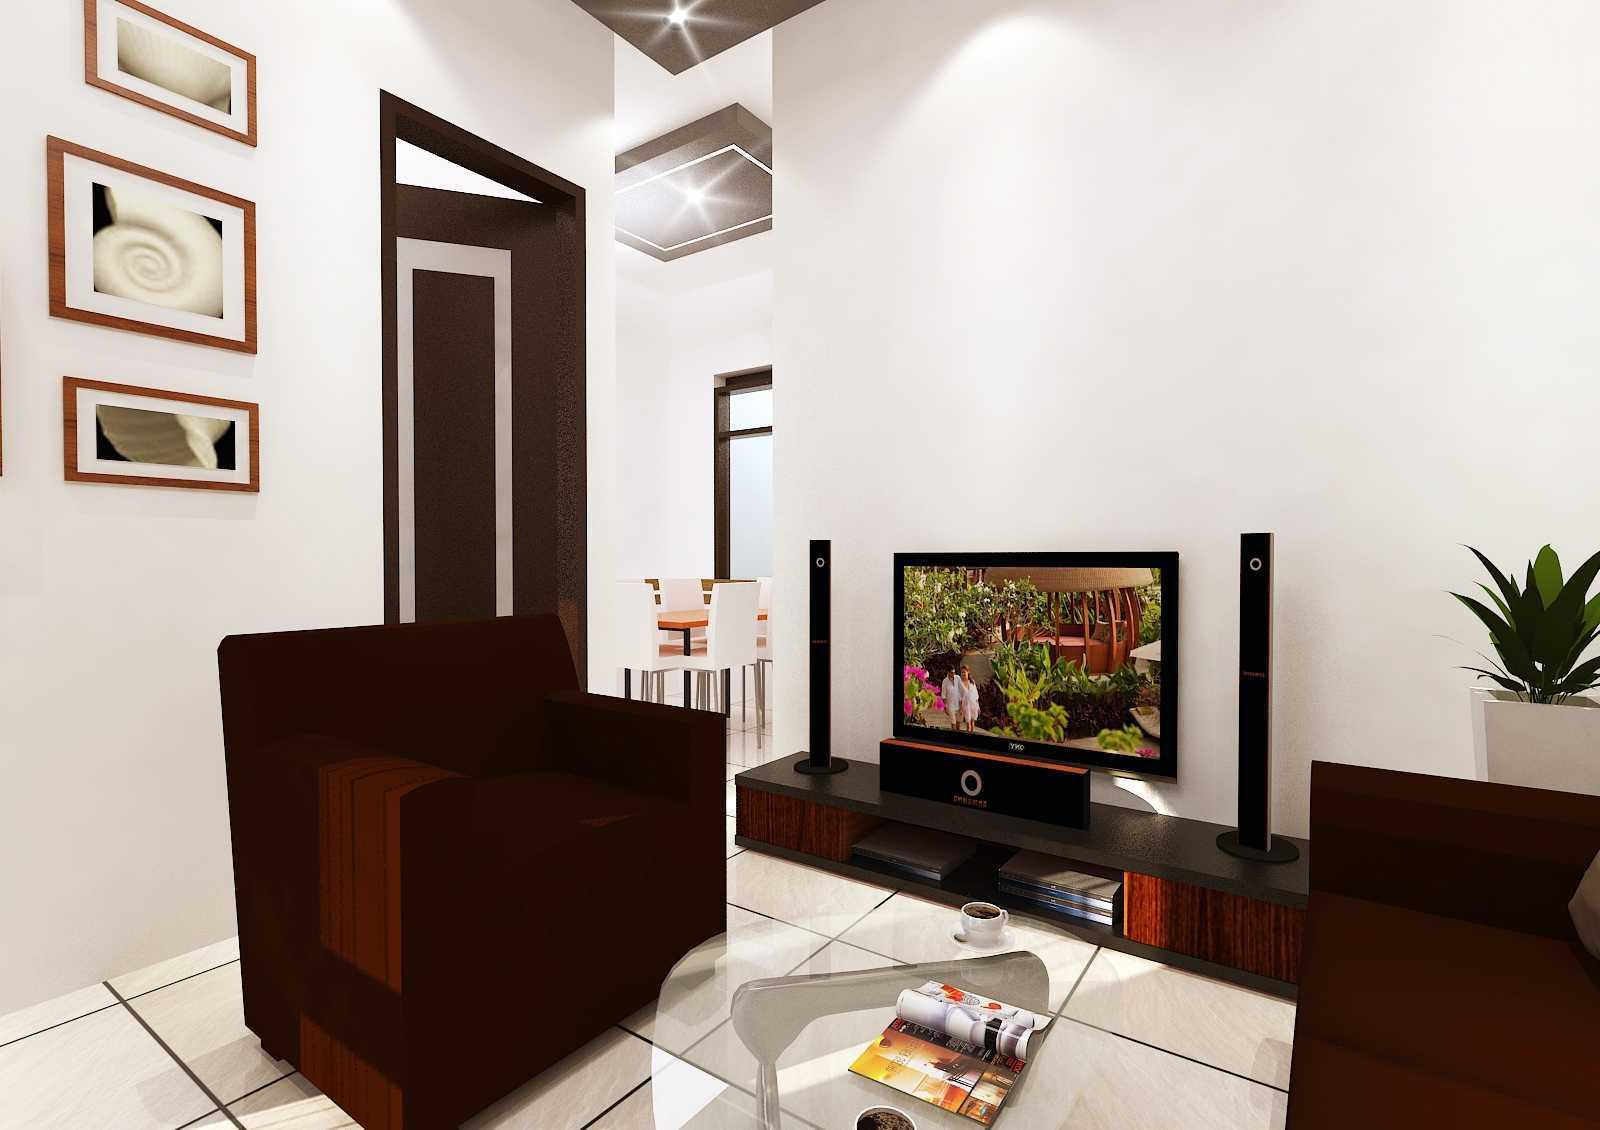 Archdesignbuild7 Rumah Tipe 36 Di Jatihandap Jatihandap, Bandung Jatihandap, Bandung Living Room Minimalis  20126